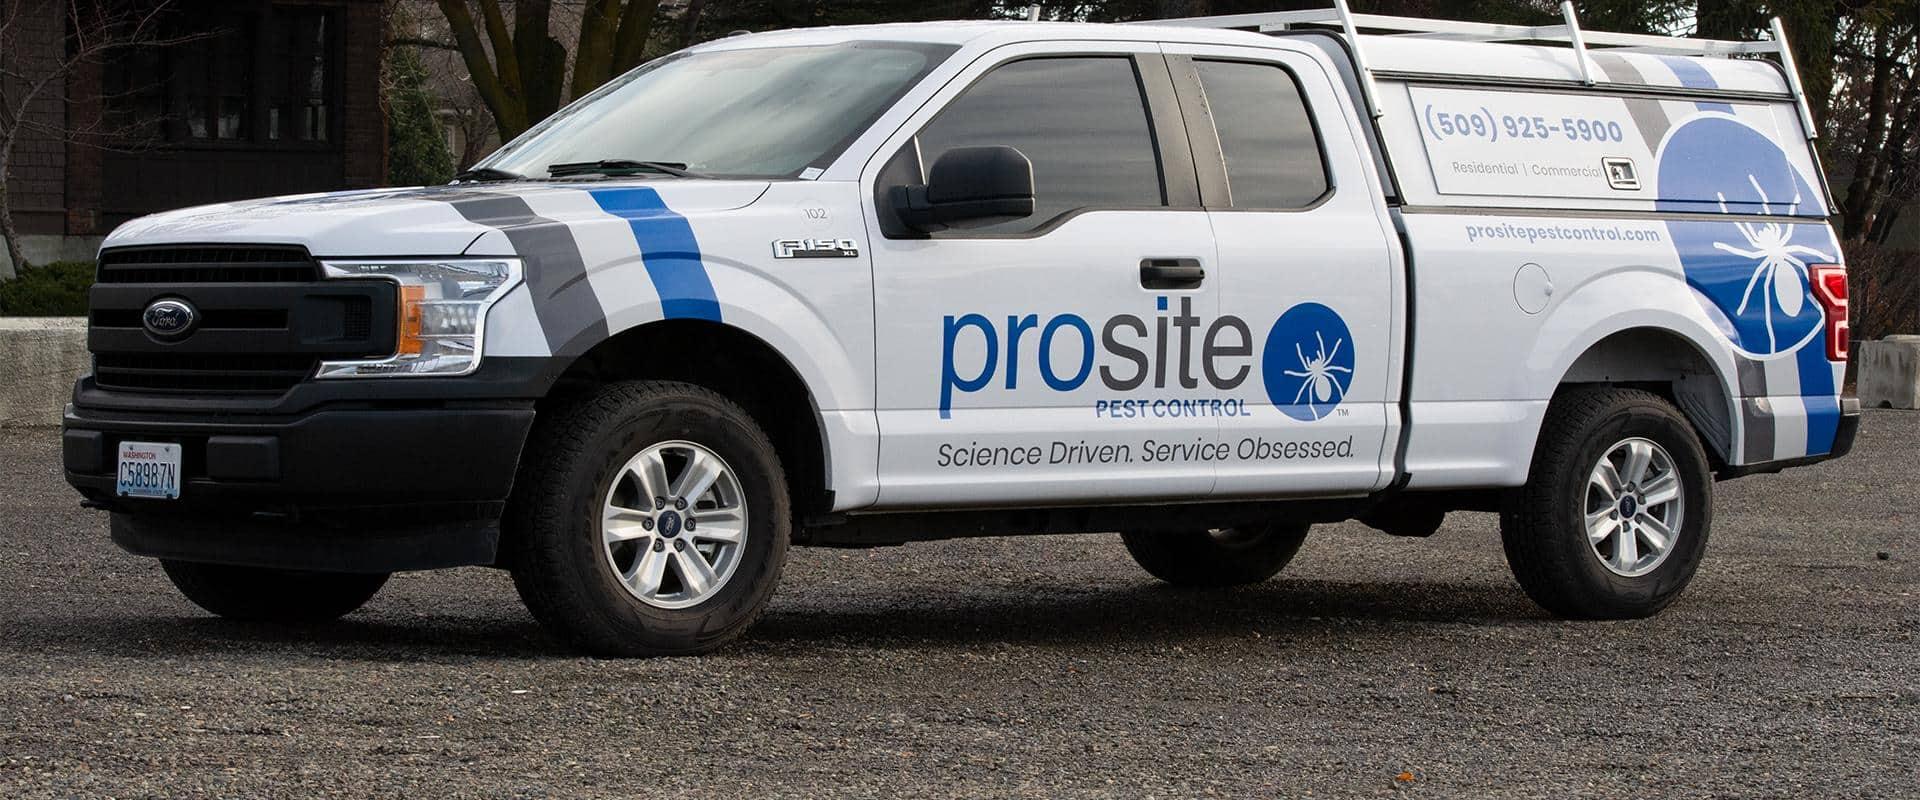 prosite pest control truck in ellensburg wa